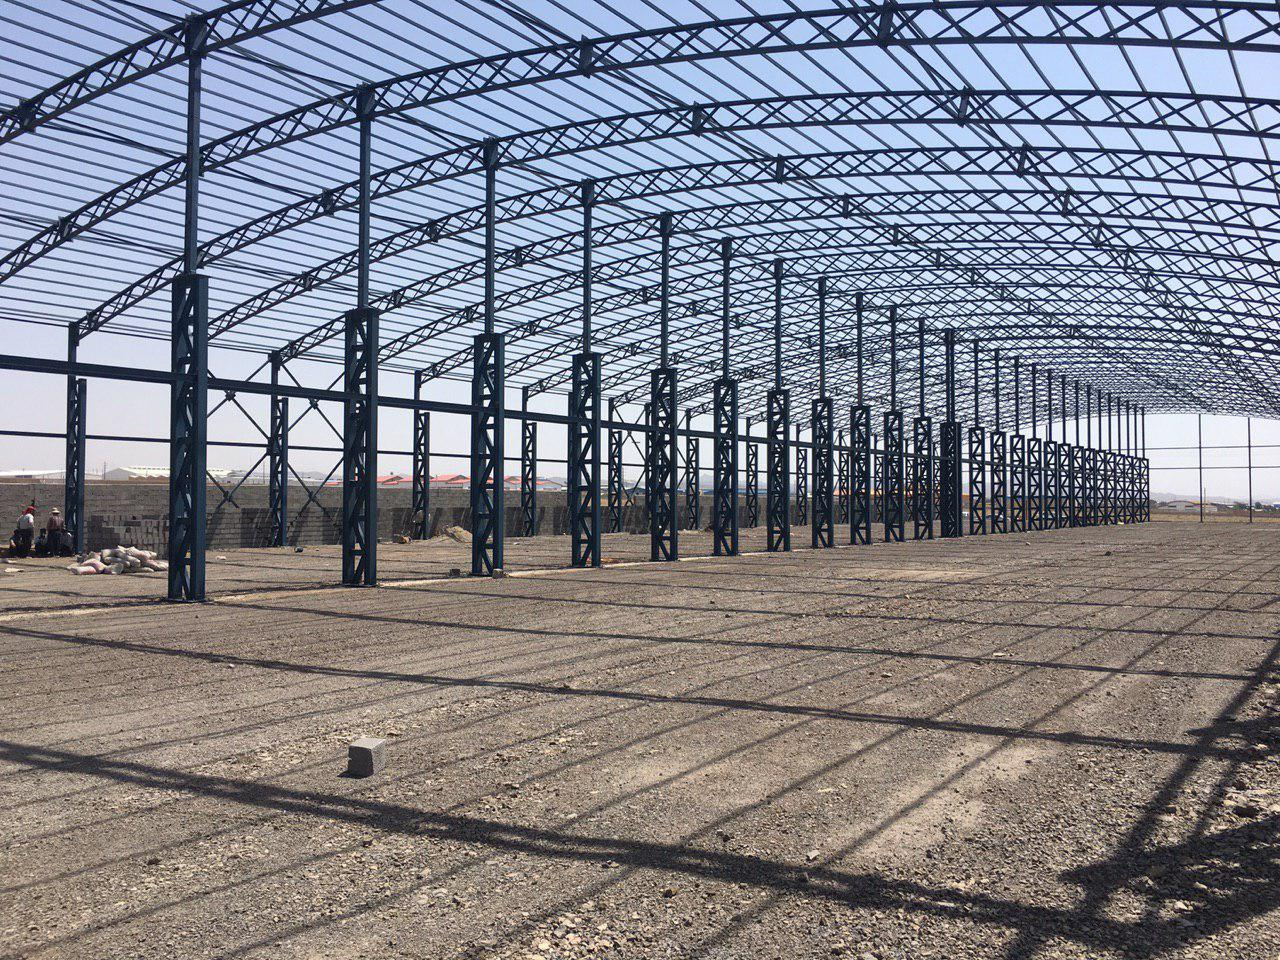 industrial shed 31 - آشنایی کامل با سوله و انواع مختلف آن | سوله سبک بیستون